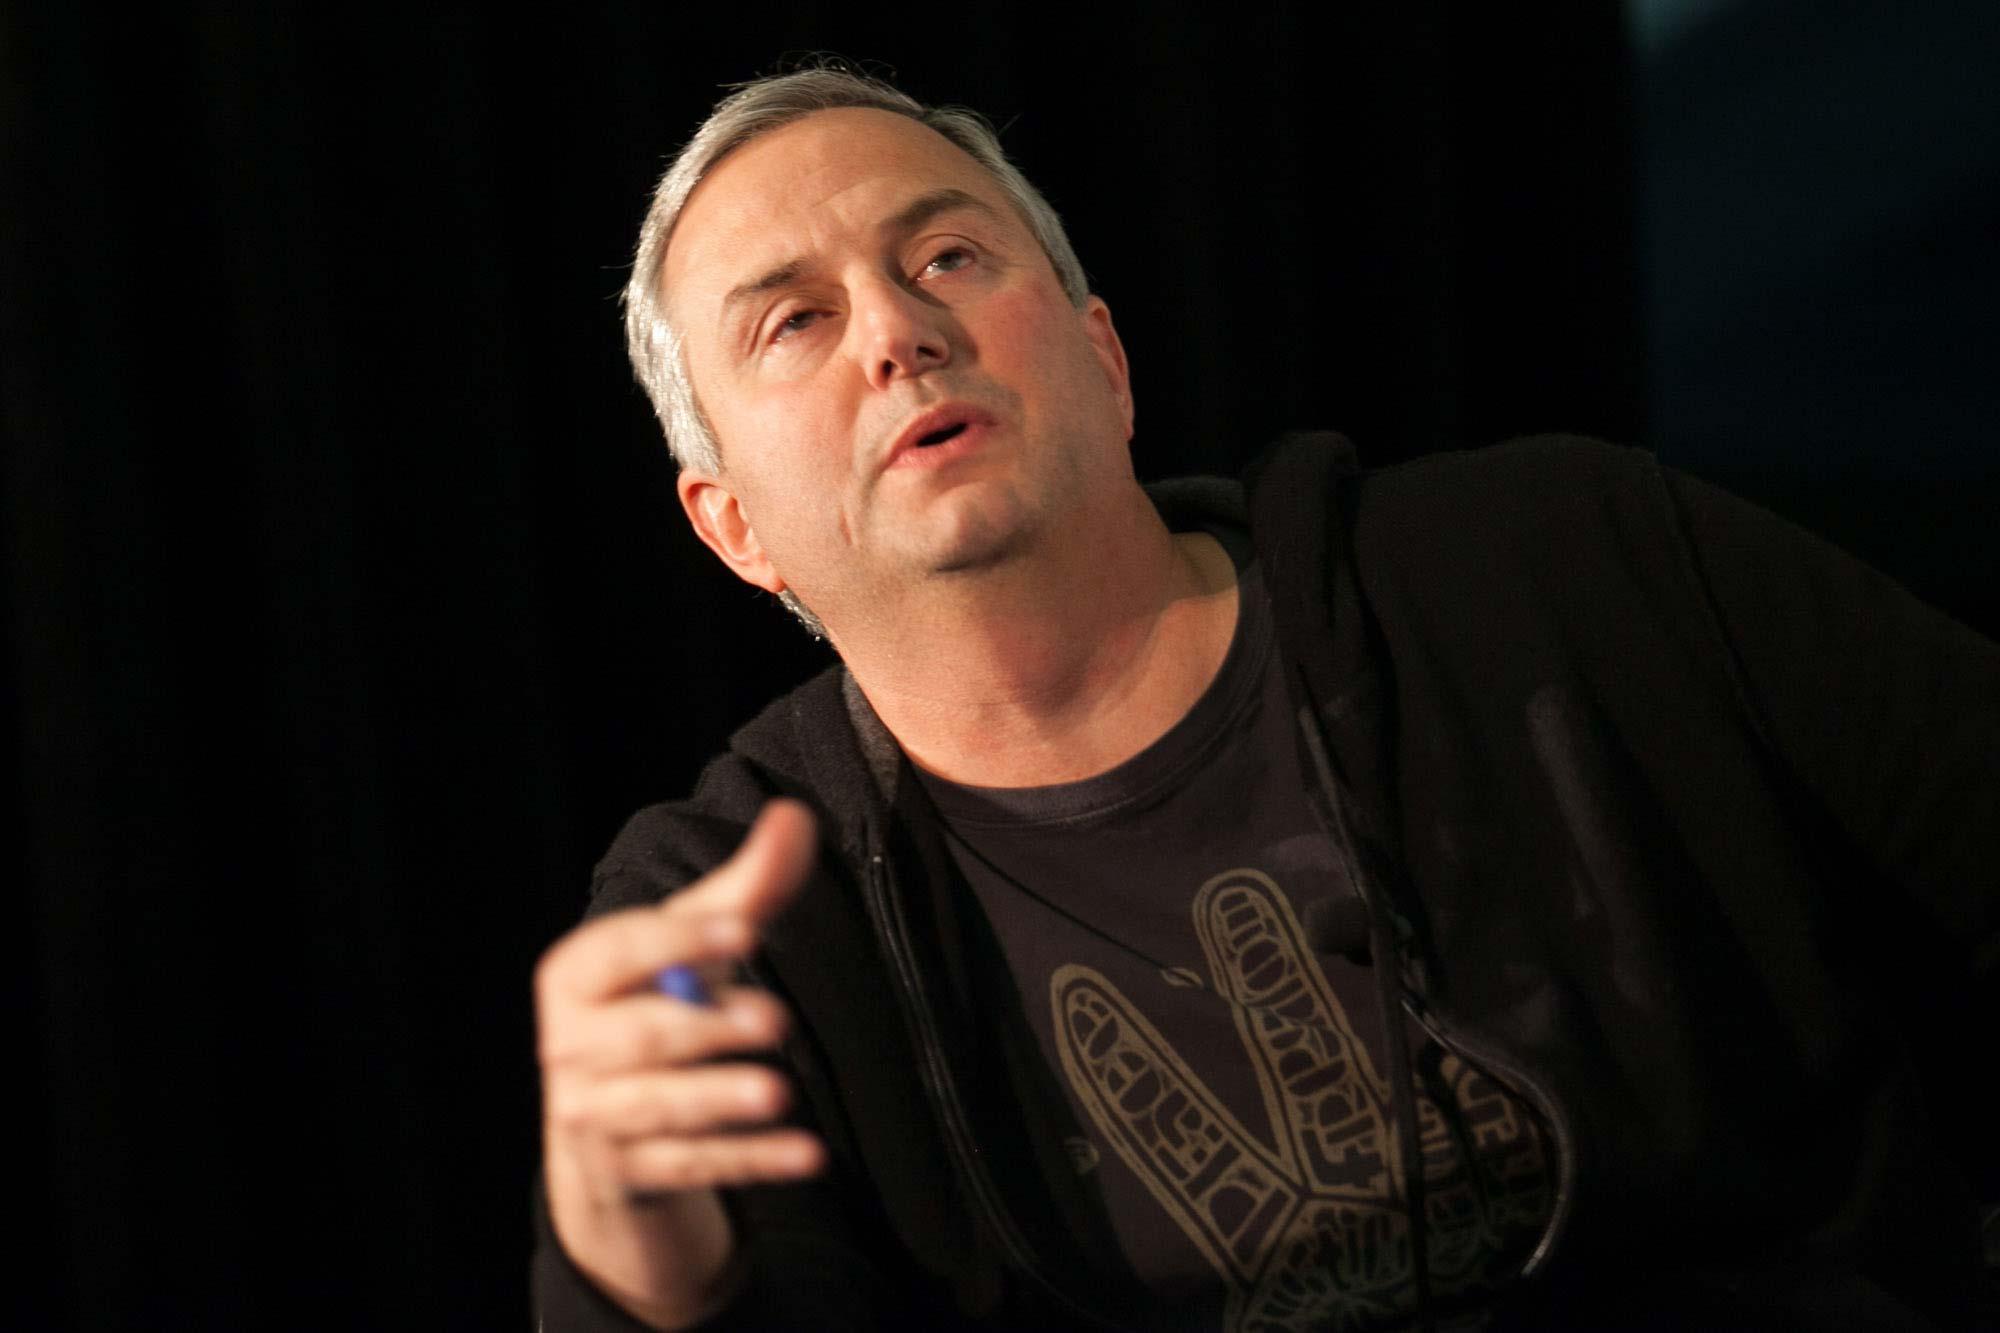 Moderator Mark Suster at Startup Grind 2014